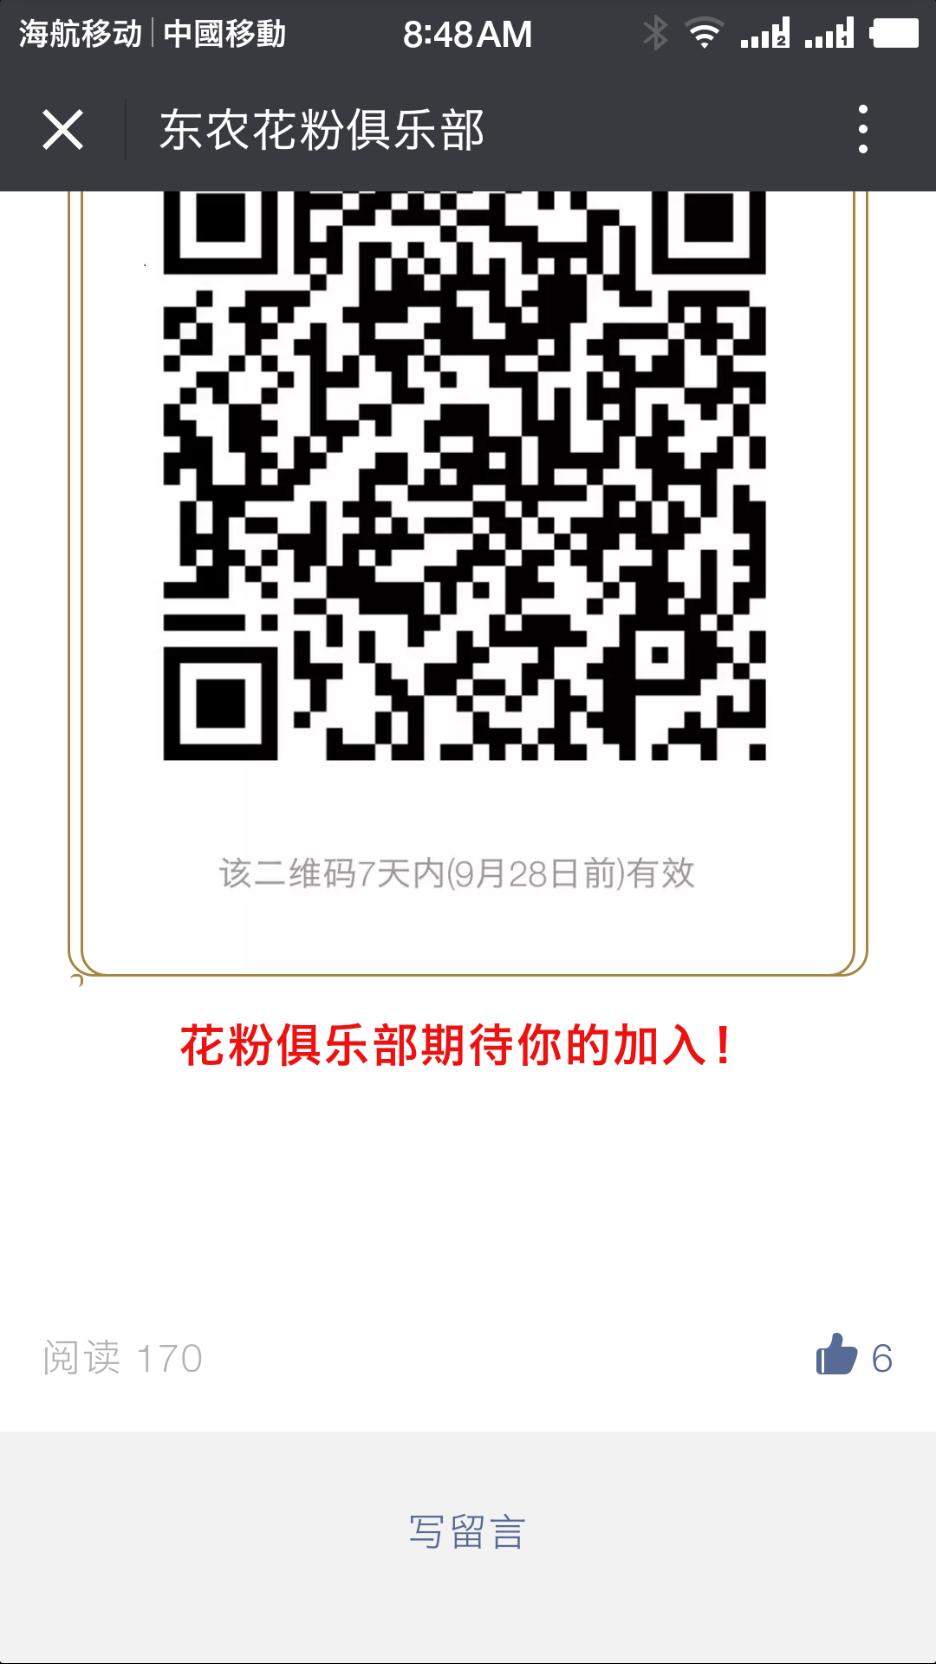 Screenshot_2019-02-07-08-48-50-772_WeChat.png